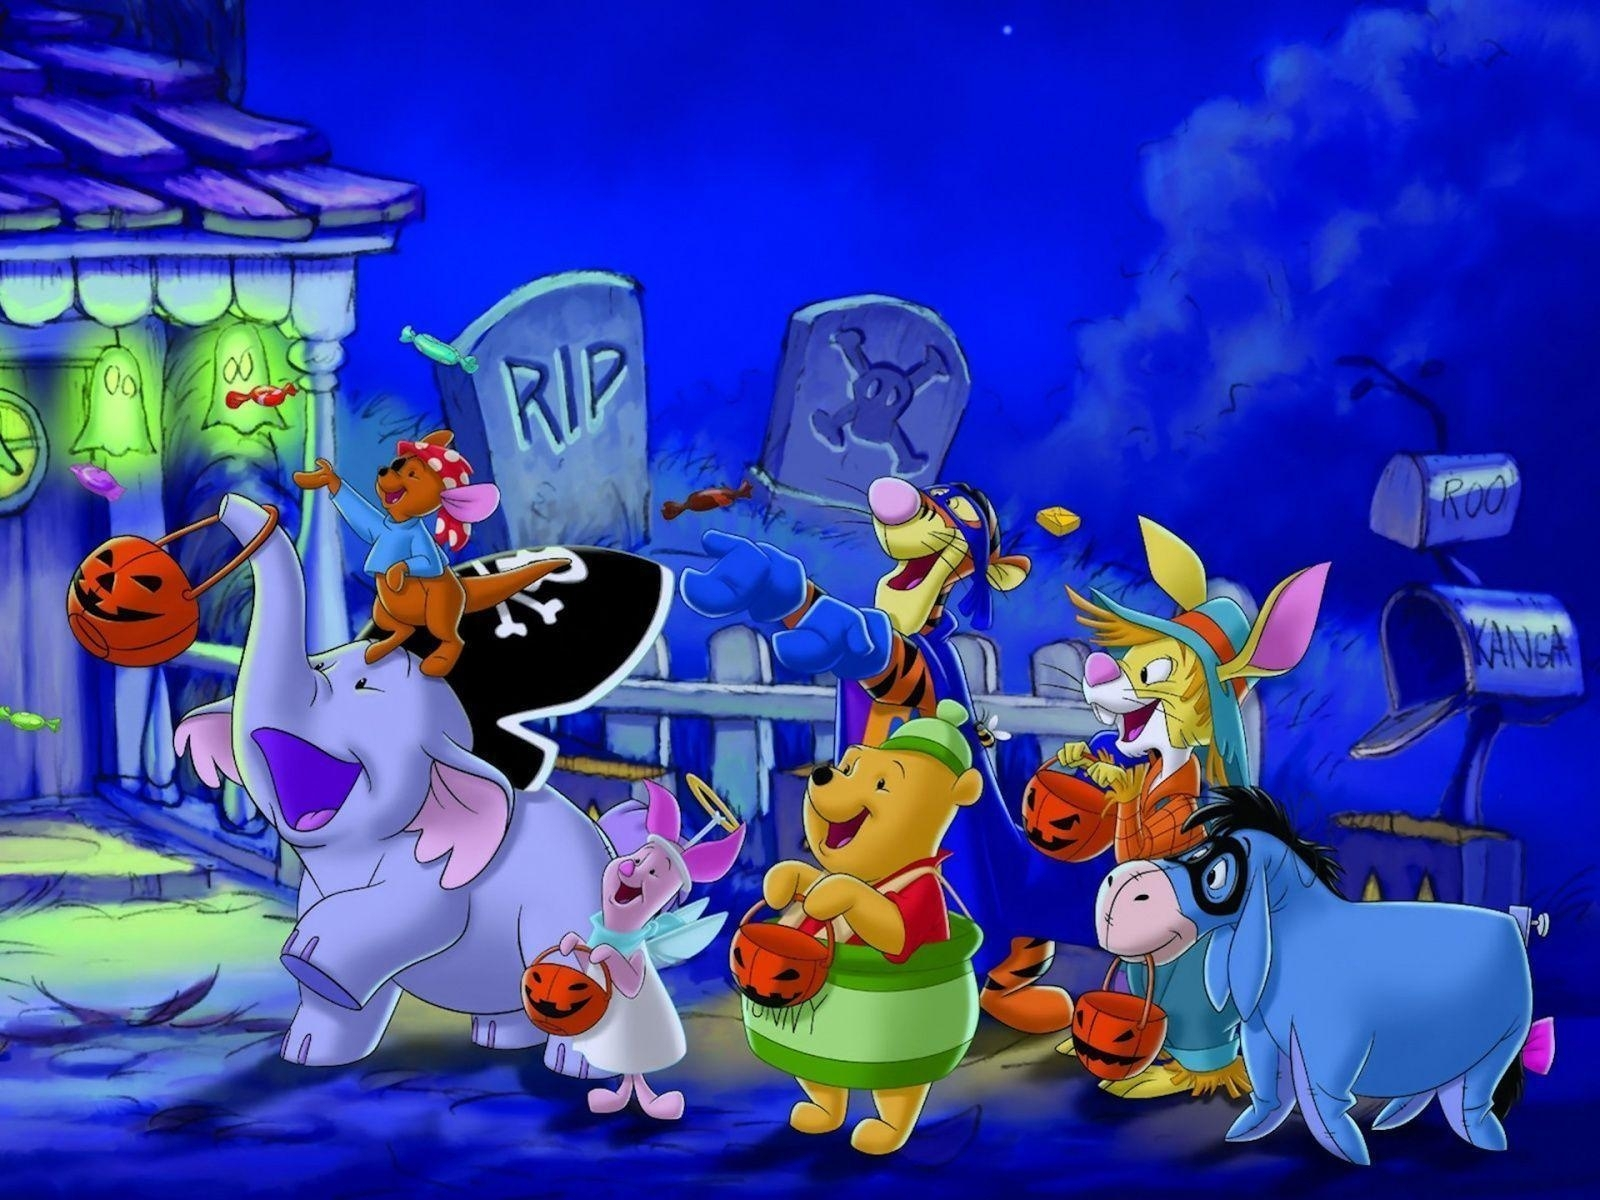 Title Disney Halloween Backgrounds Wallpaper Cave Dimension 1600 X 1200 File Type JPG JPEG